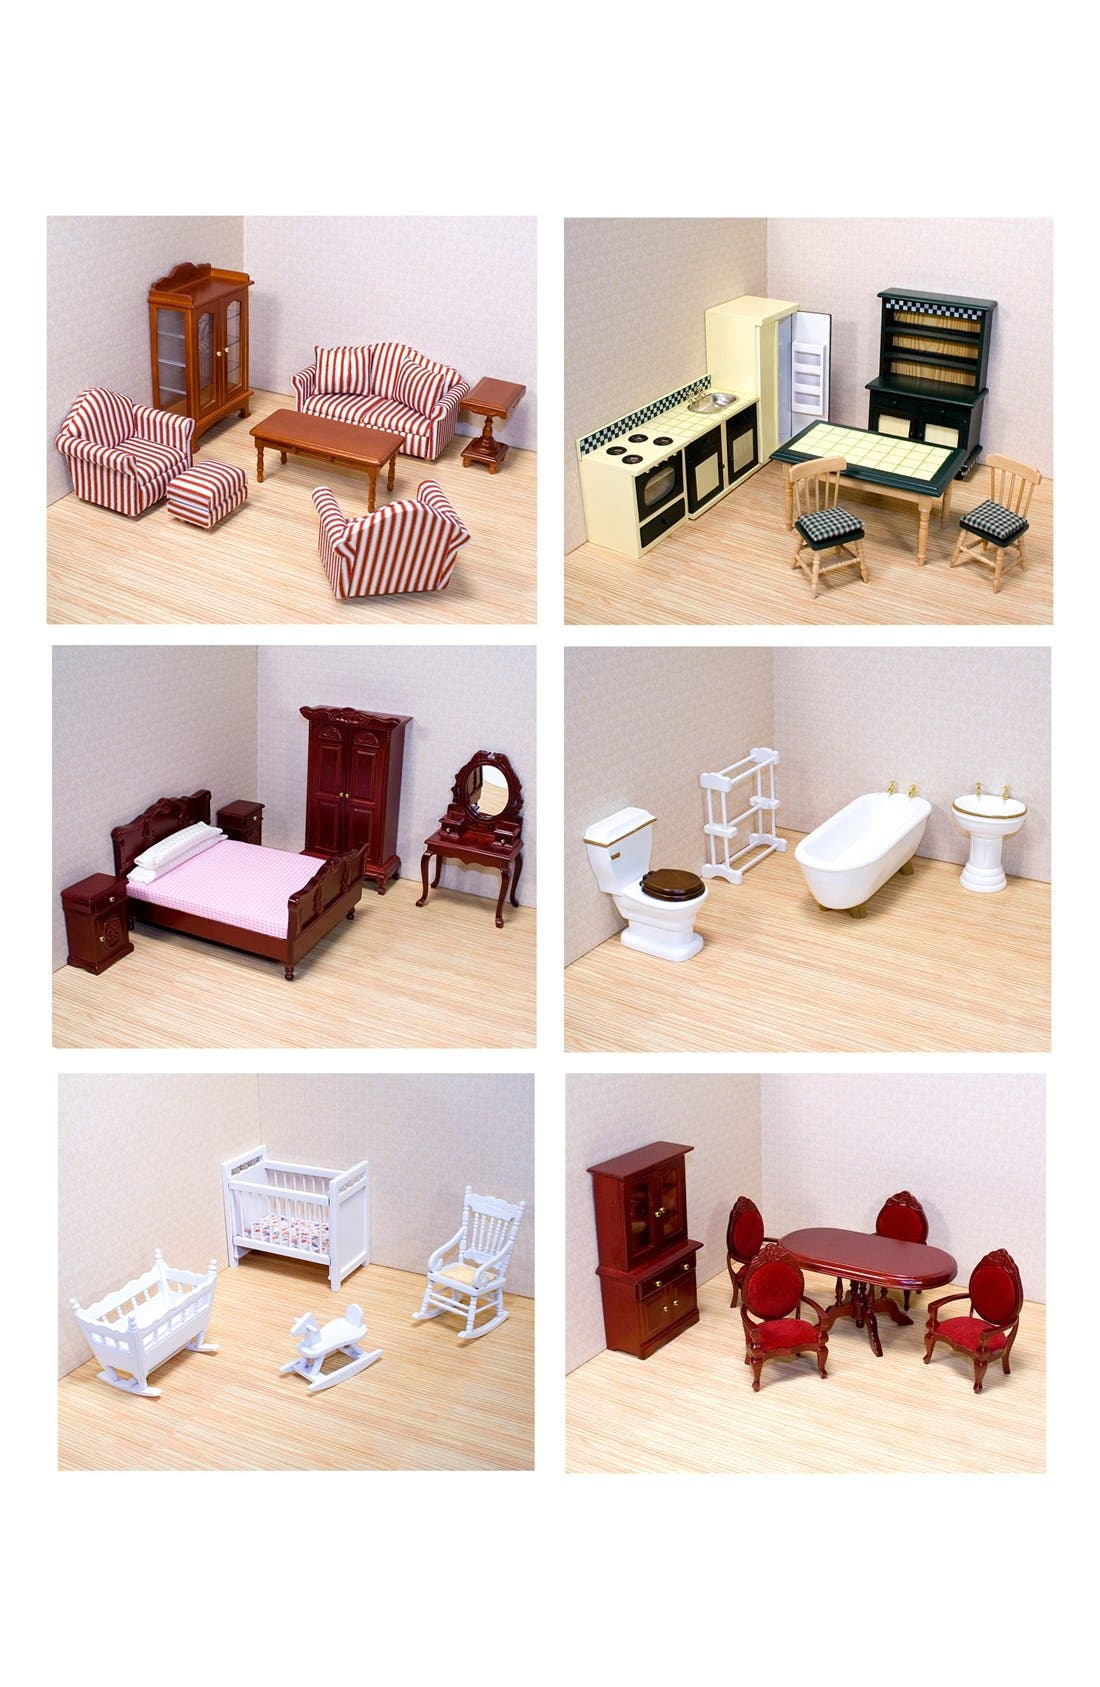 Furniture Bundle,                             Main thumbnail 1, color,                             NONE